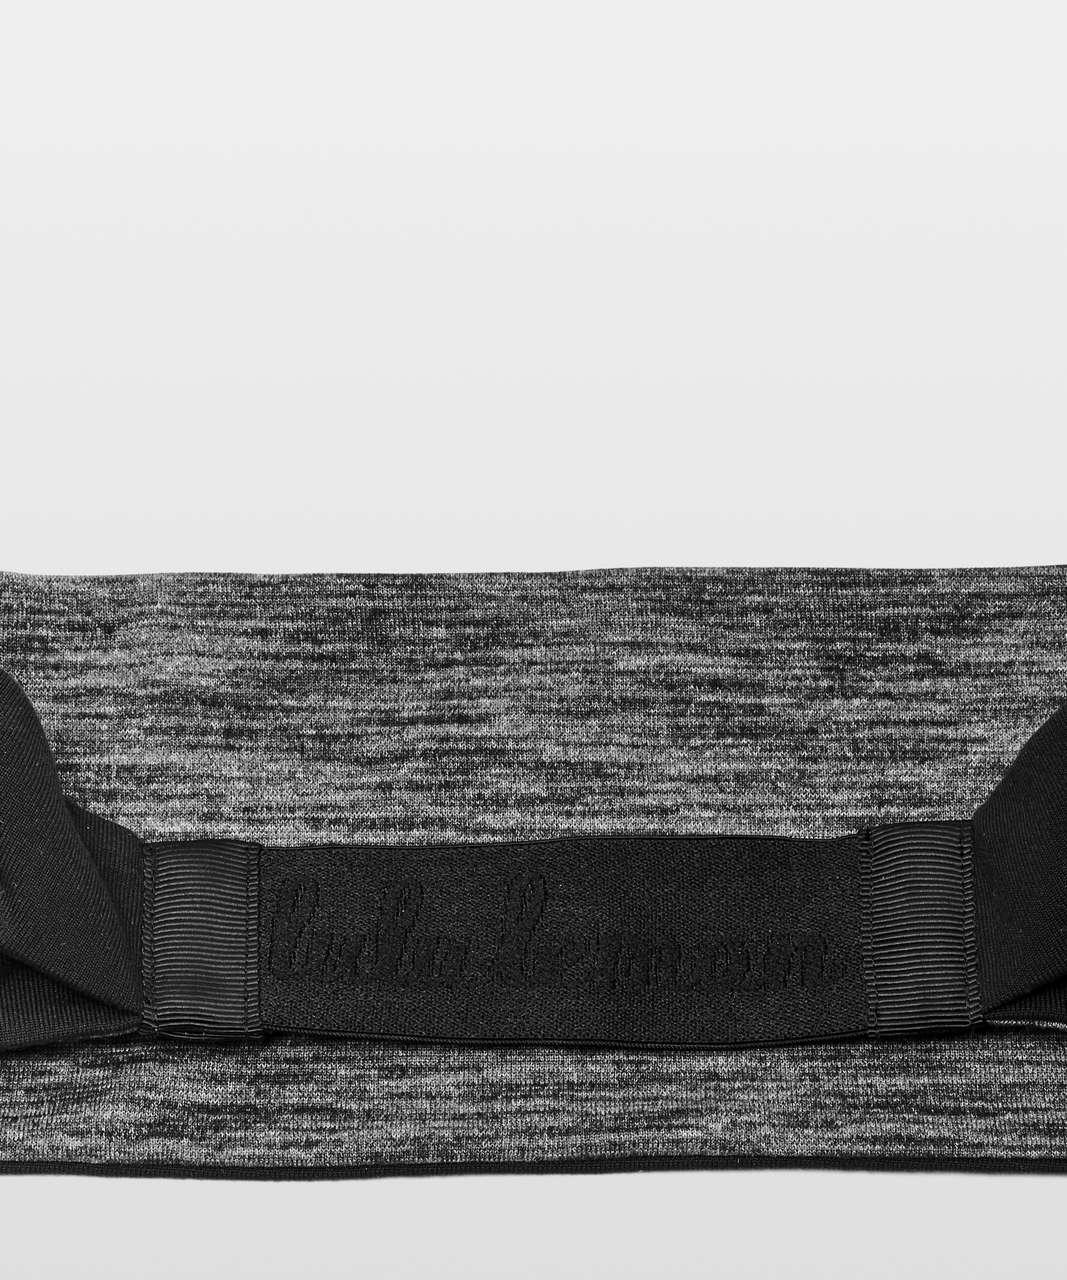 Lululemon Fringe Fighter Headband - Black / Heathered Black (Second Release)